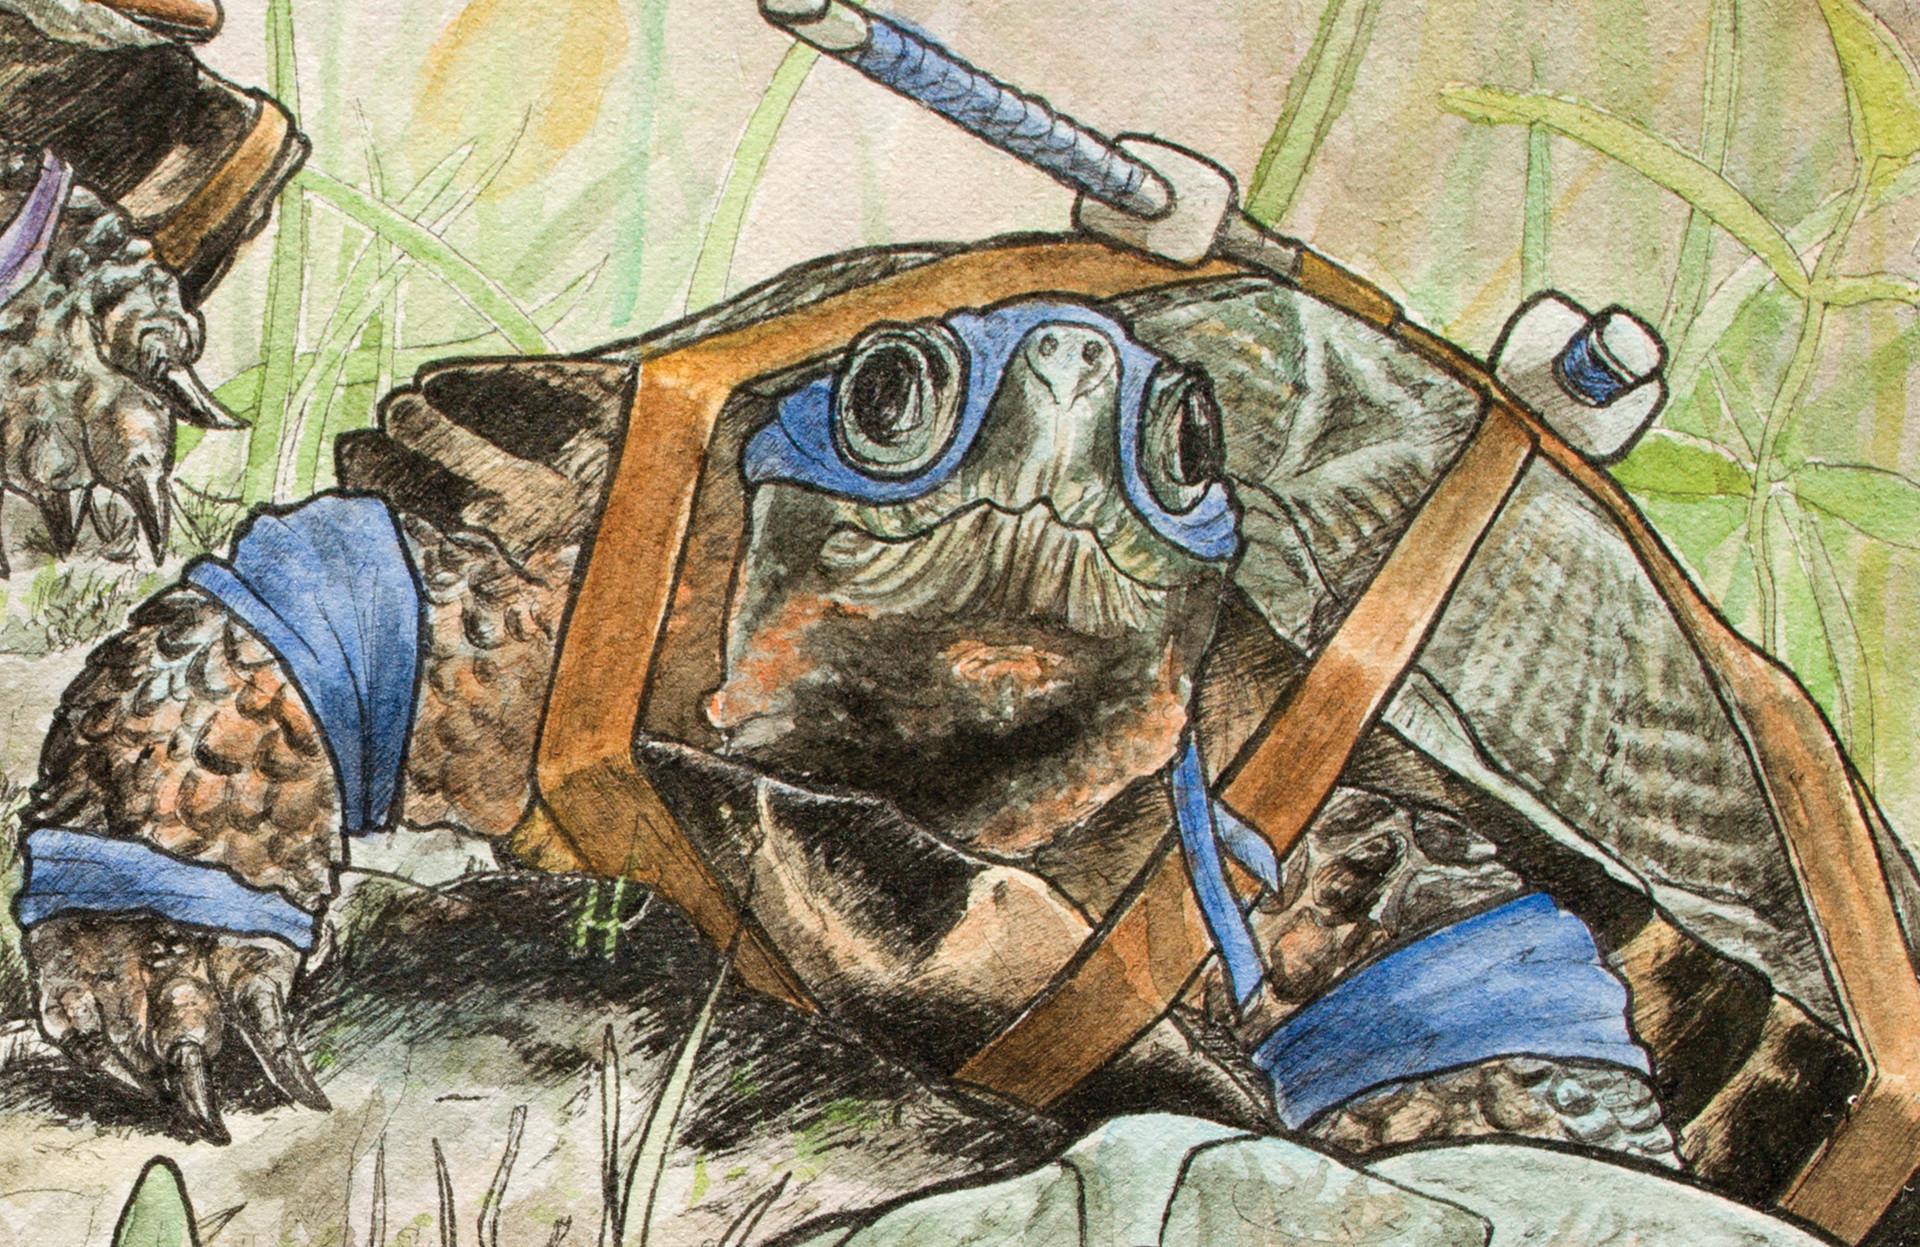 Graham moogk soulis moogk soulis turtles leo